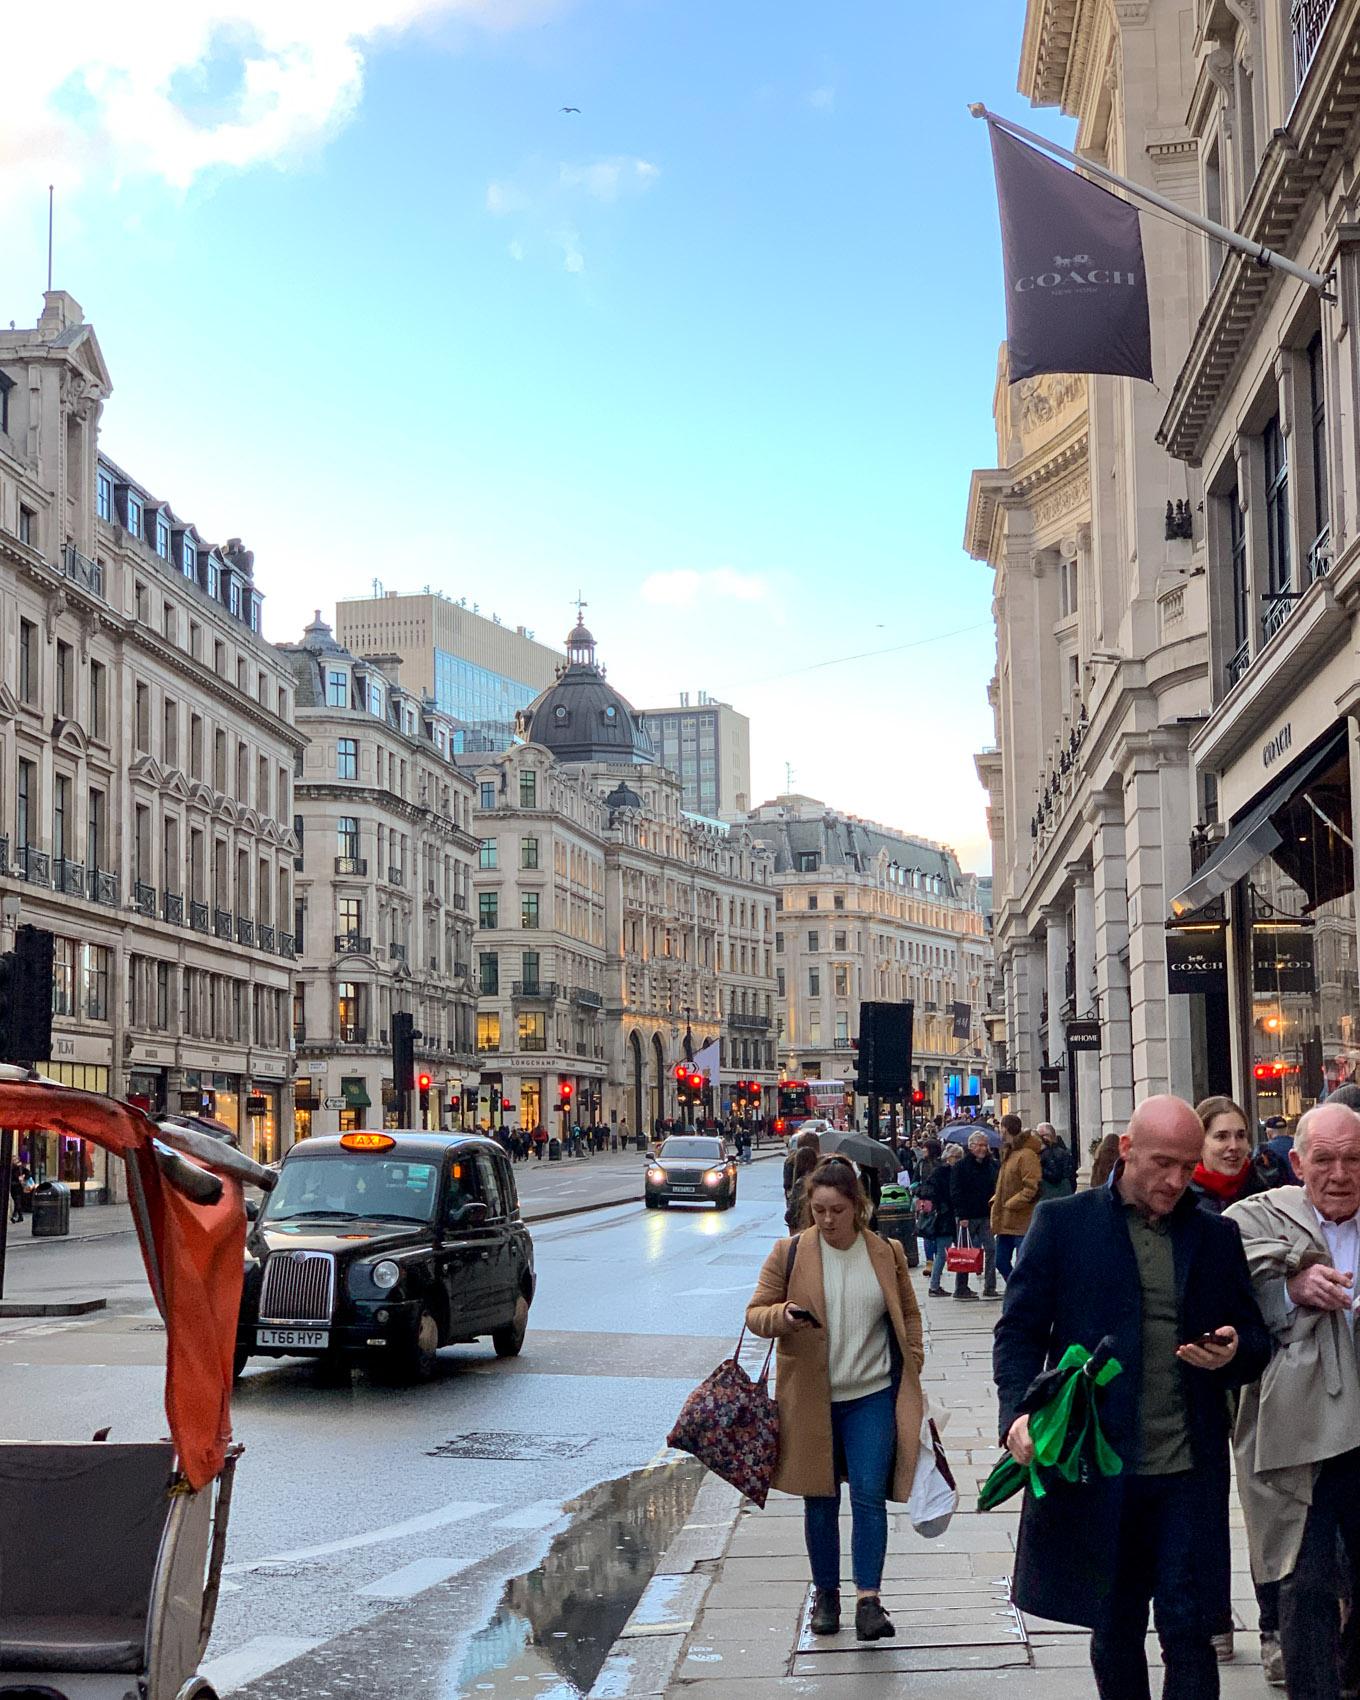 Lontoo - London - Regent Street